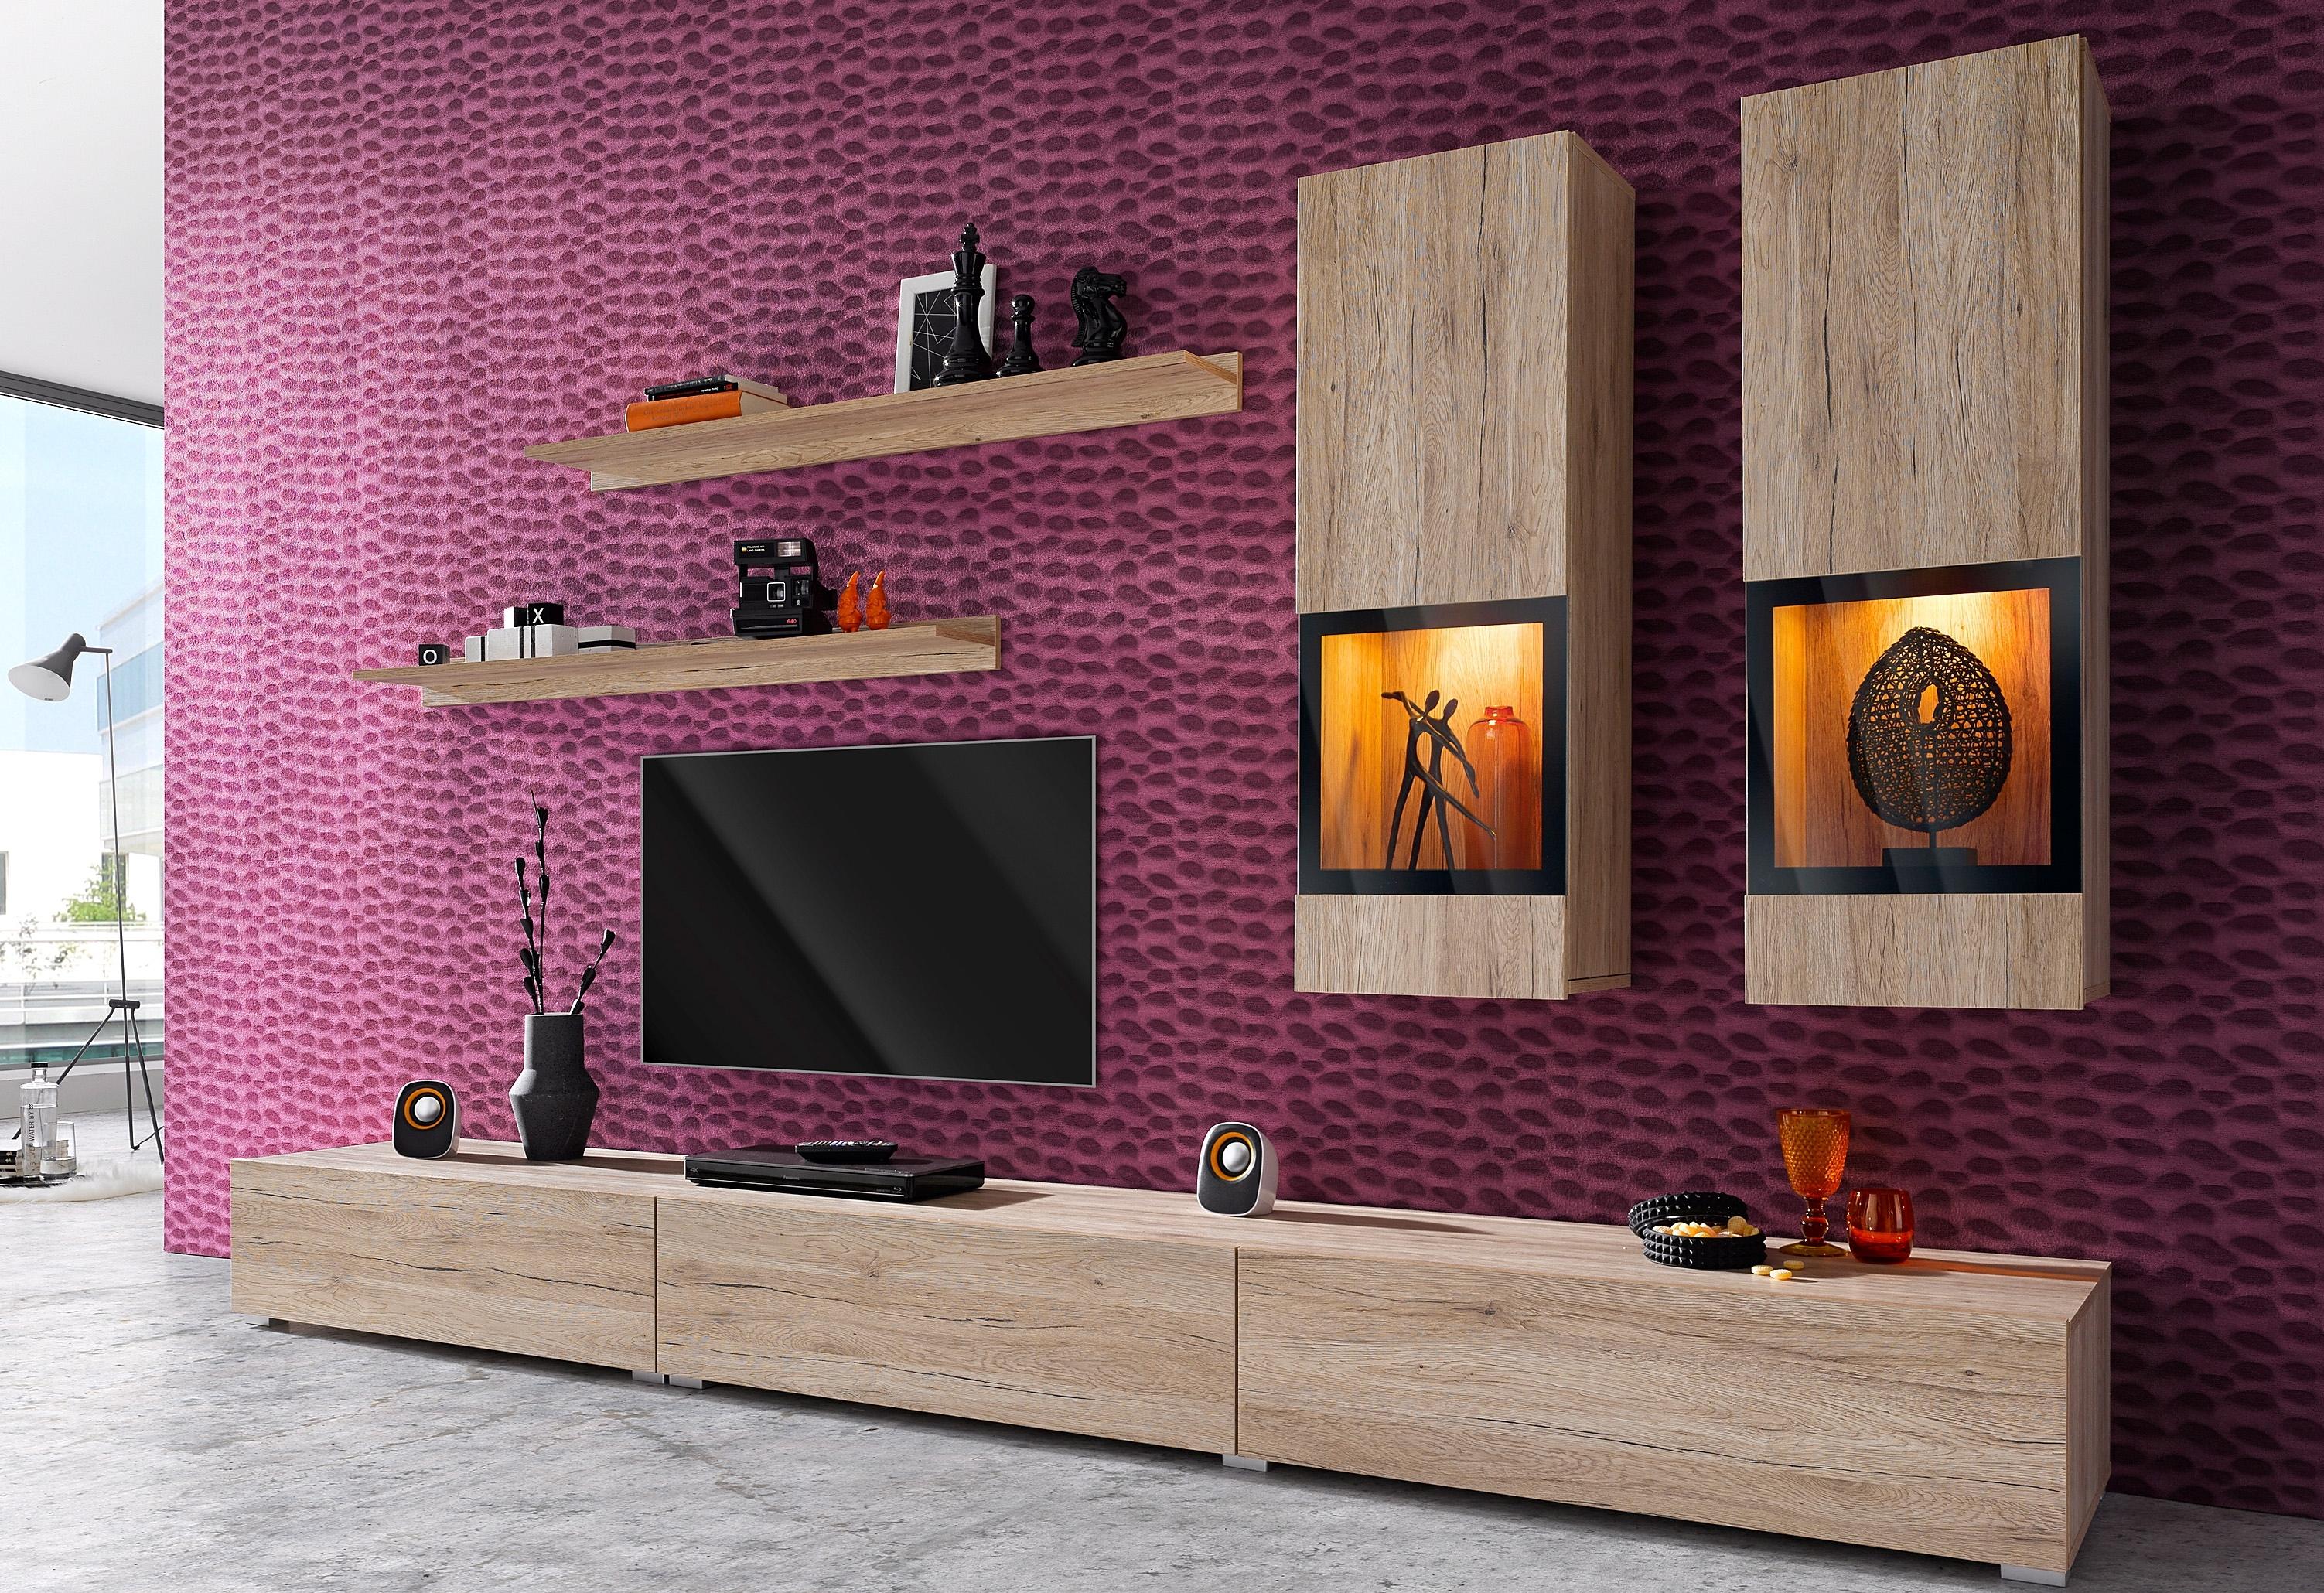 Flatscreen Audio Tv Meubel Design.Tv Meubel Online Kopen Ruim 400 Tv Meubels Otto